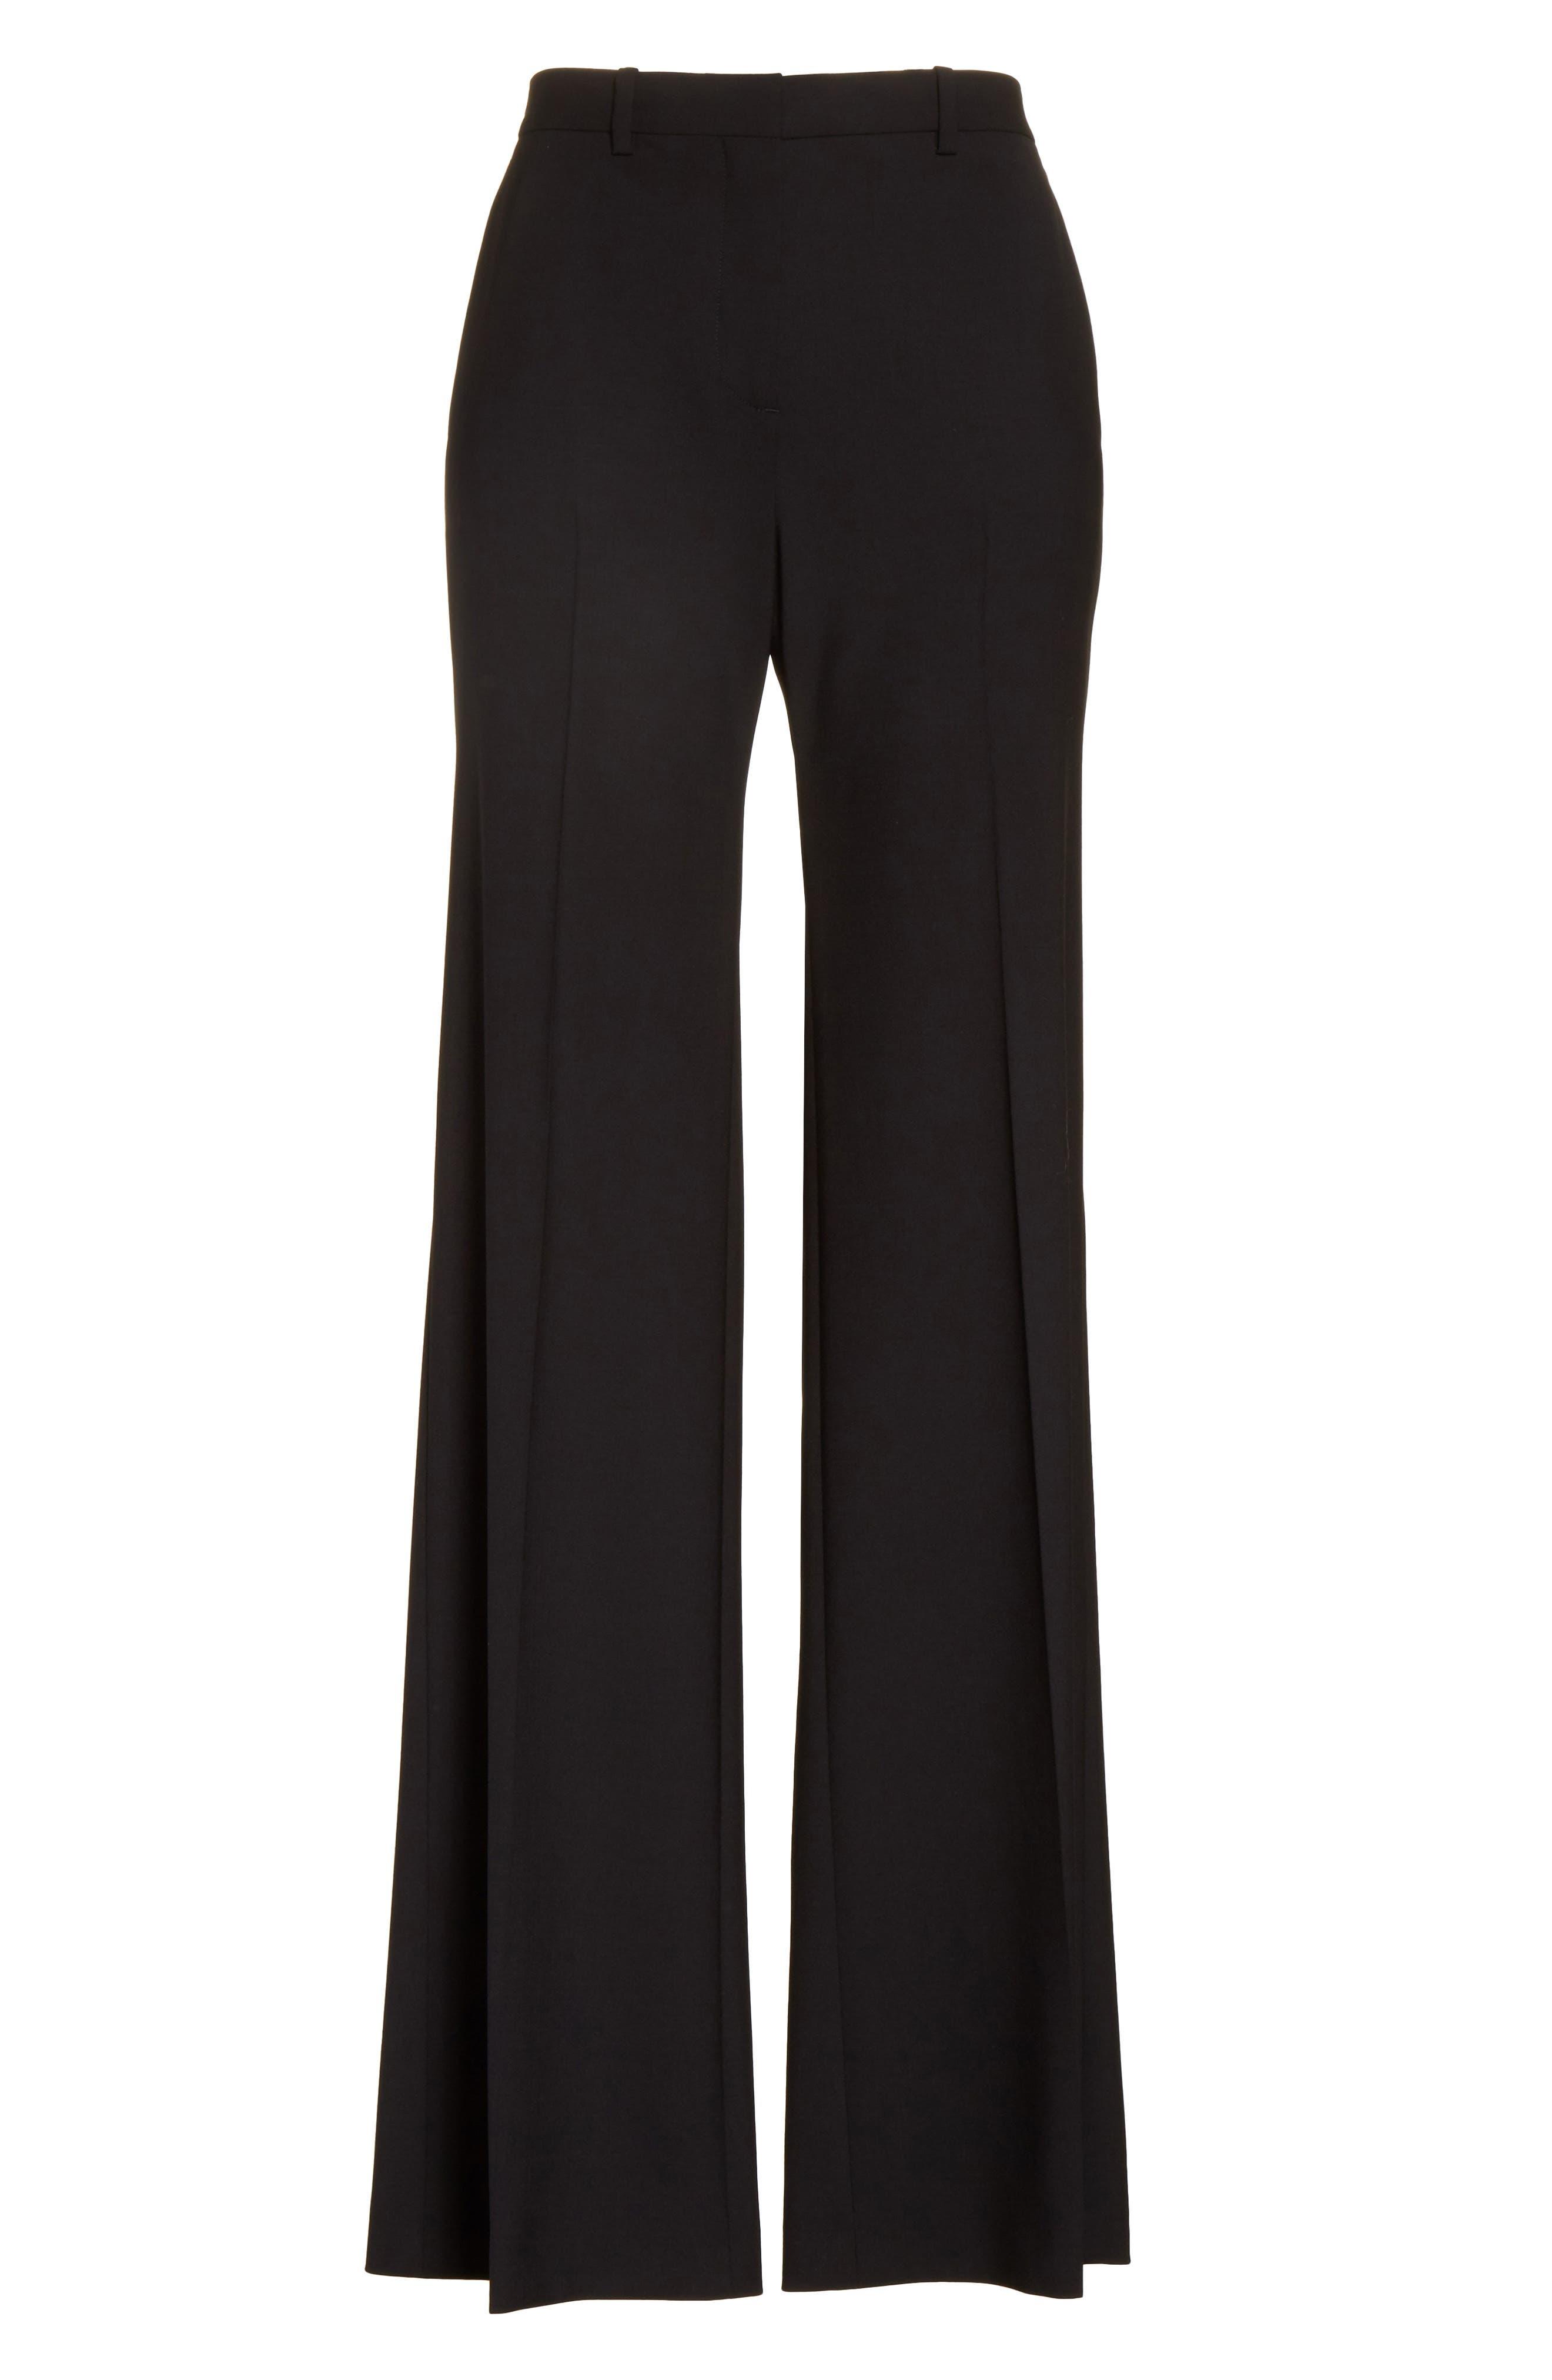 THEORY, Demetria 2 Flare Leg Good Wool Suit Pants, Alternate thumbnail 7, color, BLACK